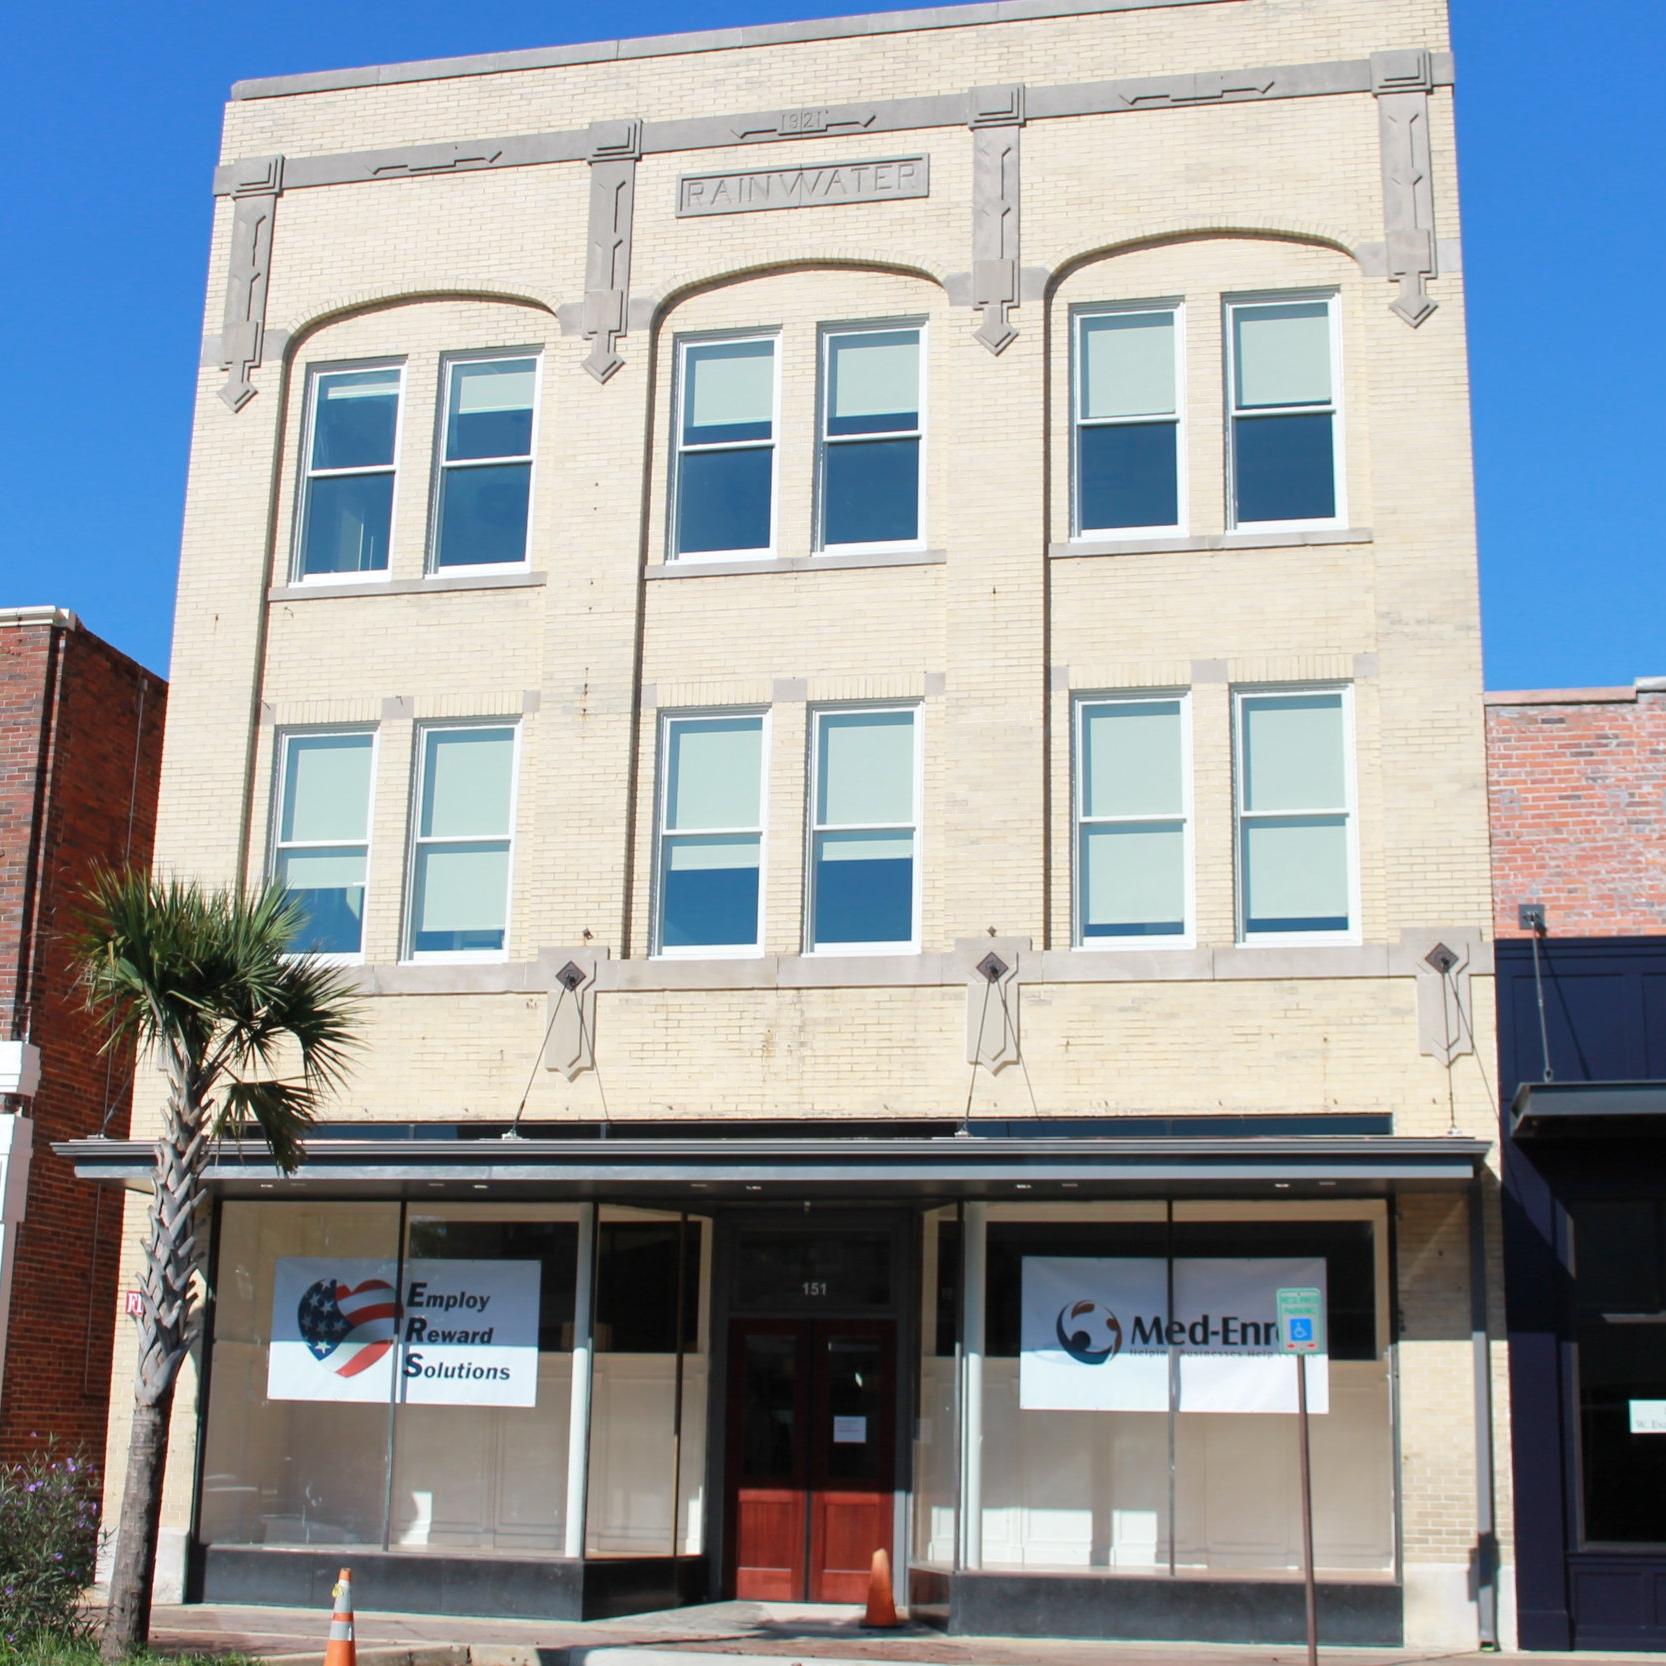 Rainwater Building - Florence, SCOfficeClient: BCN Holdings Inc.Built: 1921Project Costs: $2.4 millionHTC equity: Over $1.08 millionCompletion Date: 2015